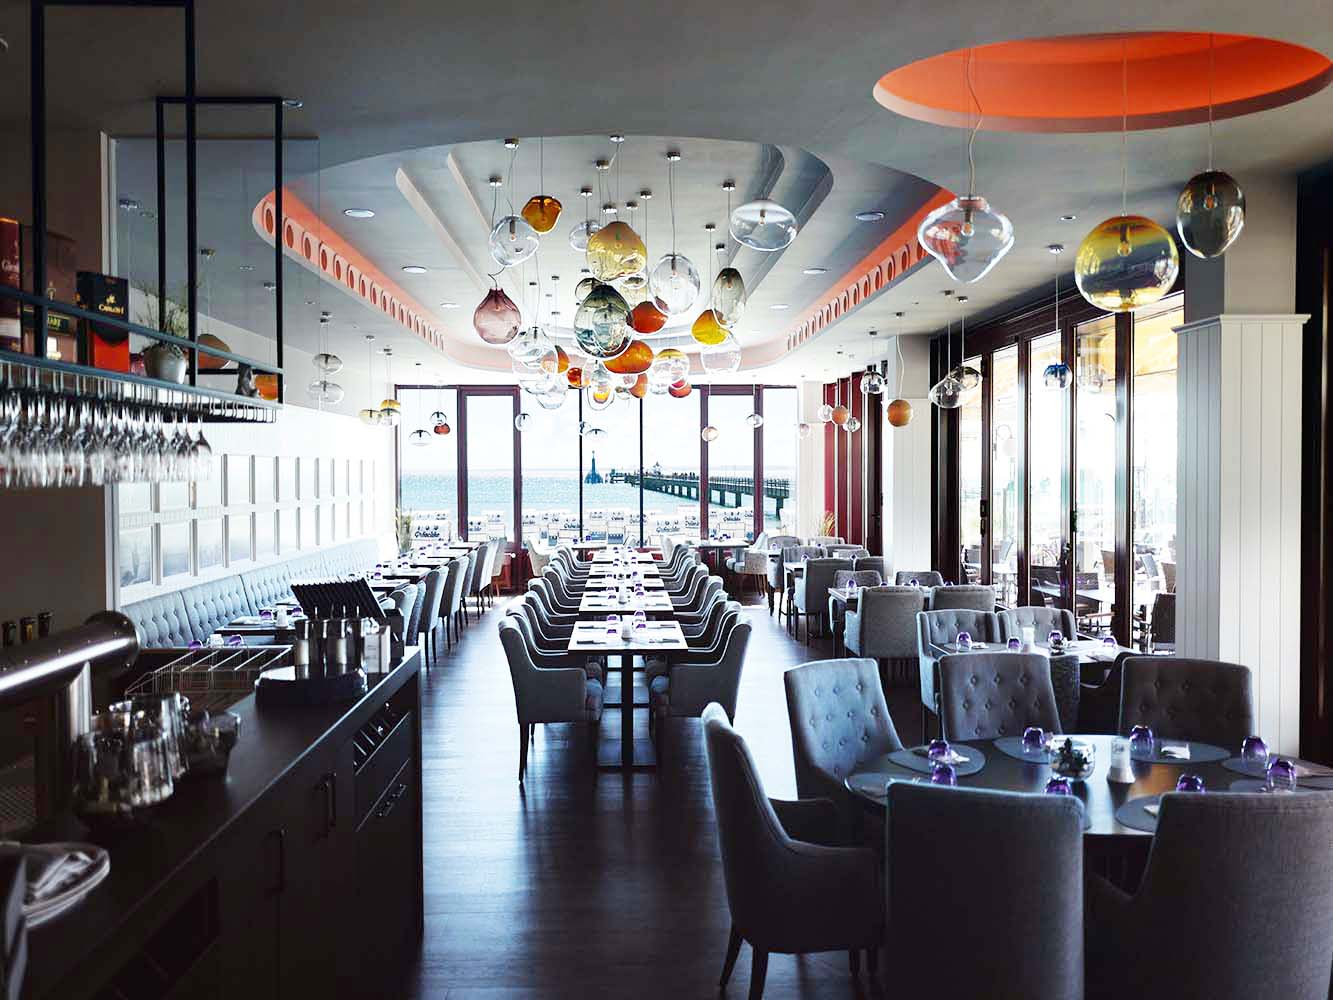 ELOA_Project_Restaurant&Bar_Seaside_photoby_Esther_Gummig_01_RGB_LR_web